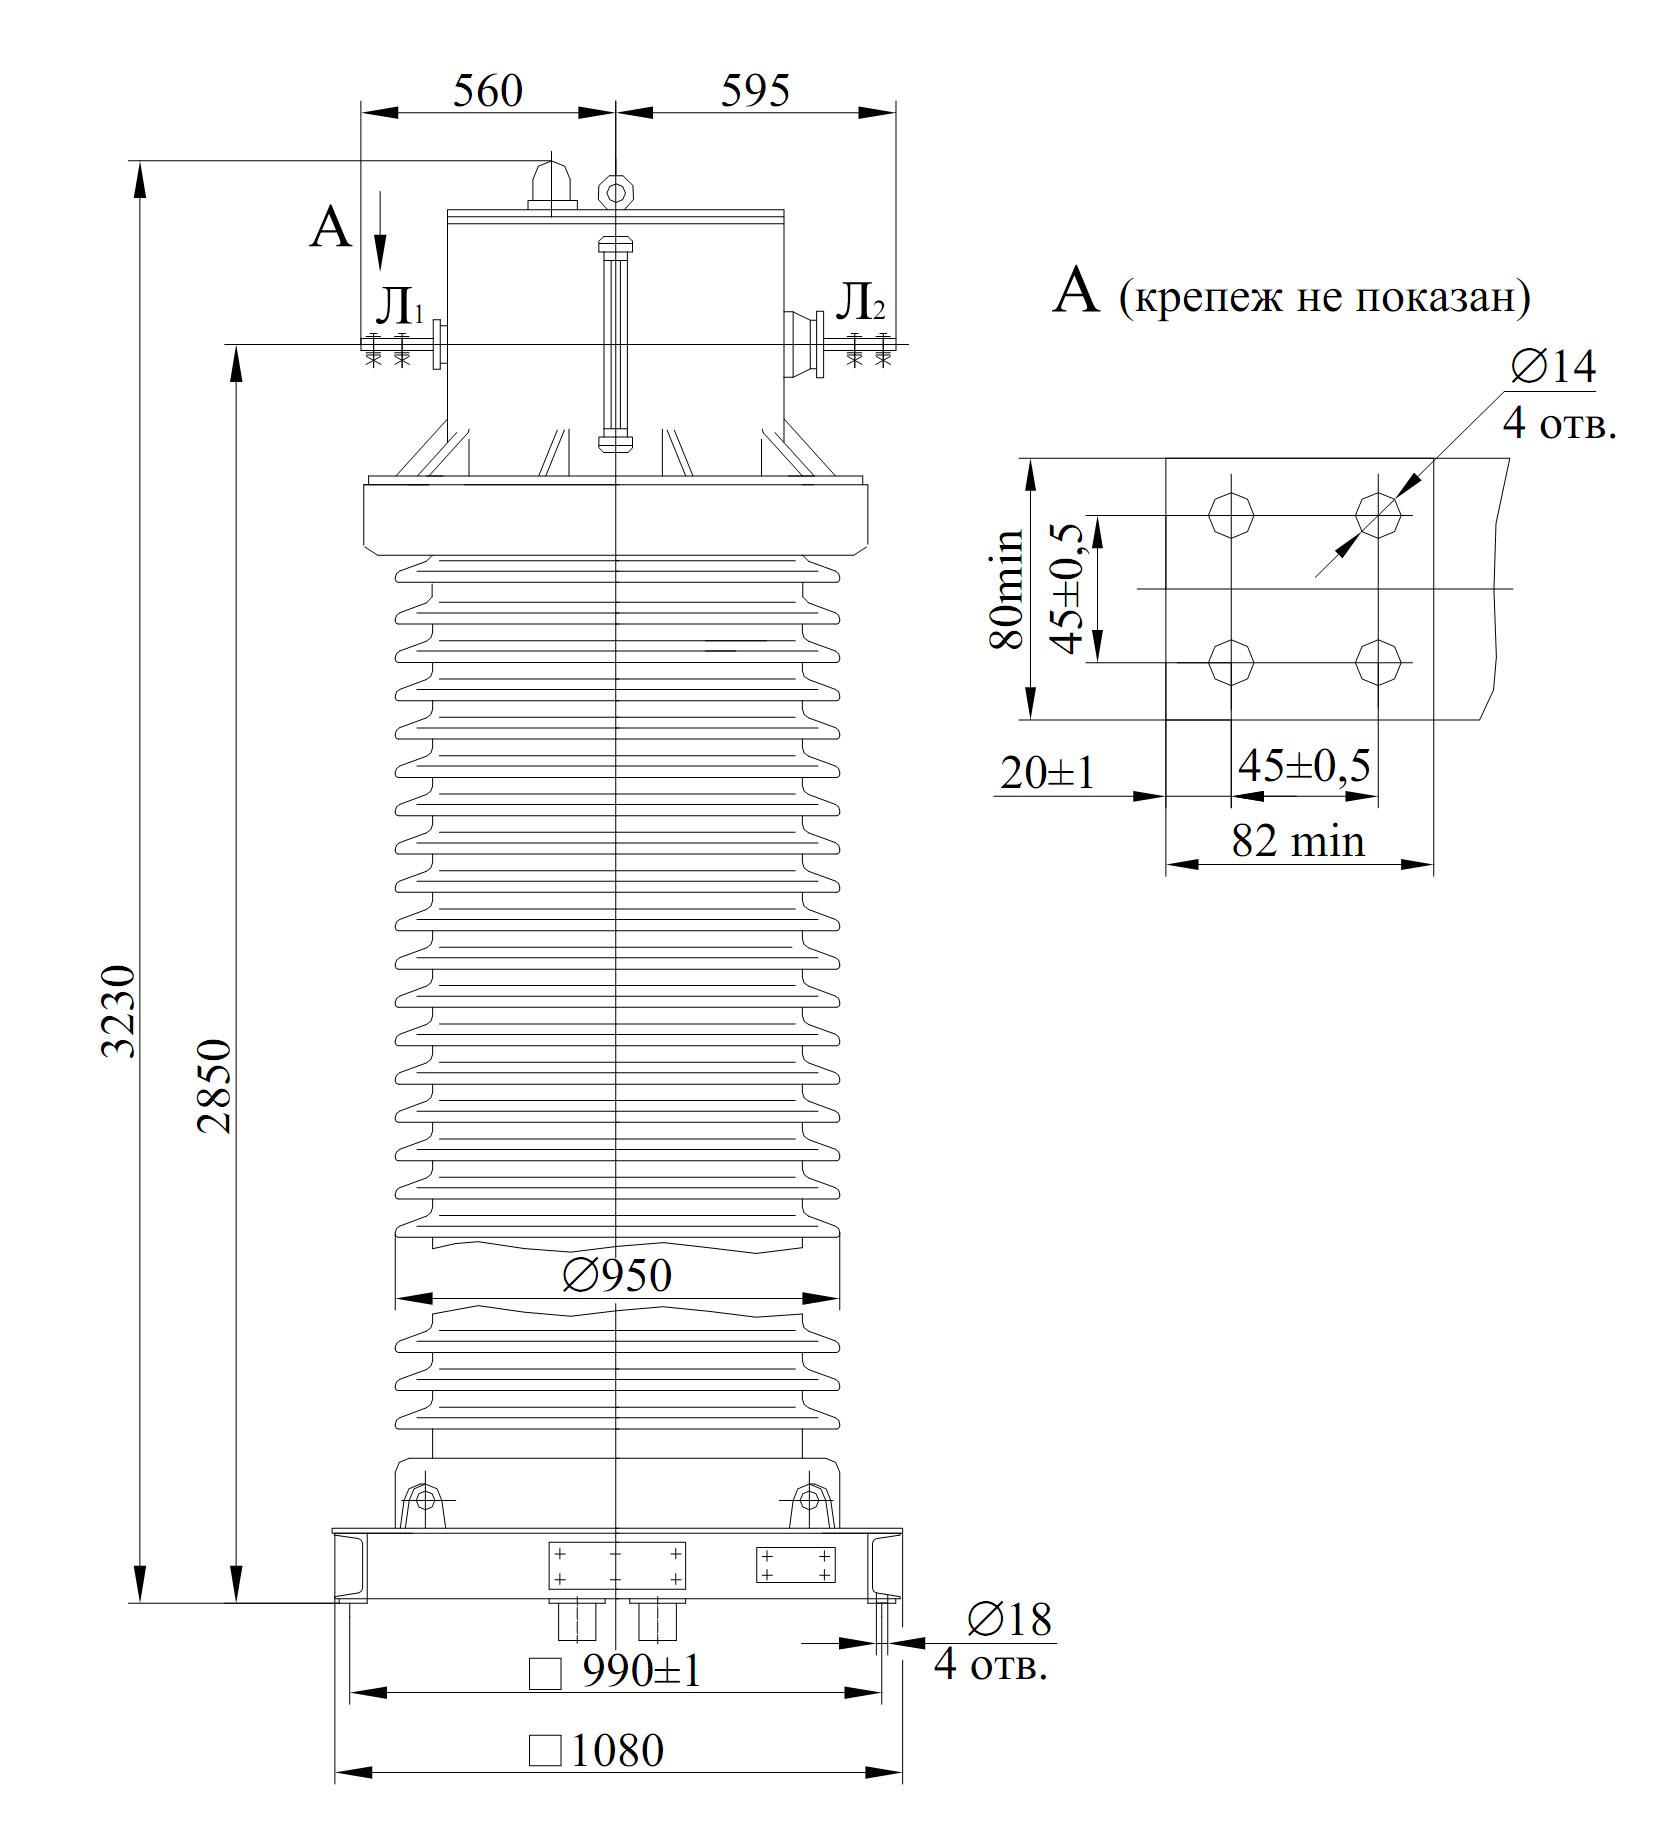 Чертеж трансформатора ТФЗМ-220 Б-IV (ТФЗМ-245 II-IV)